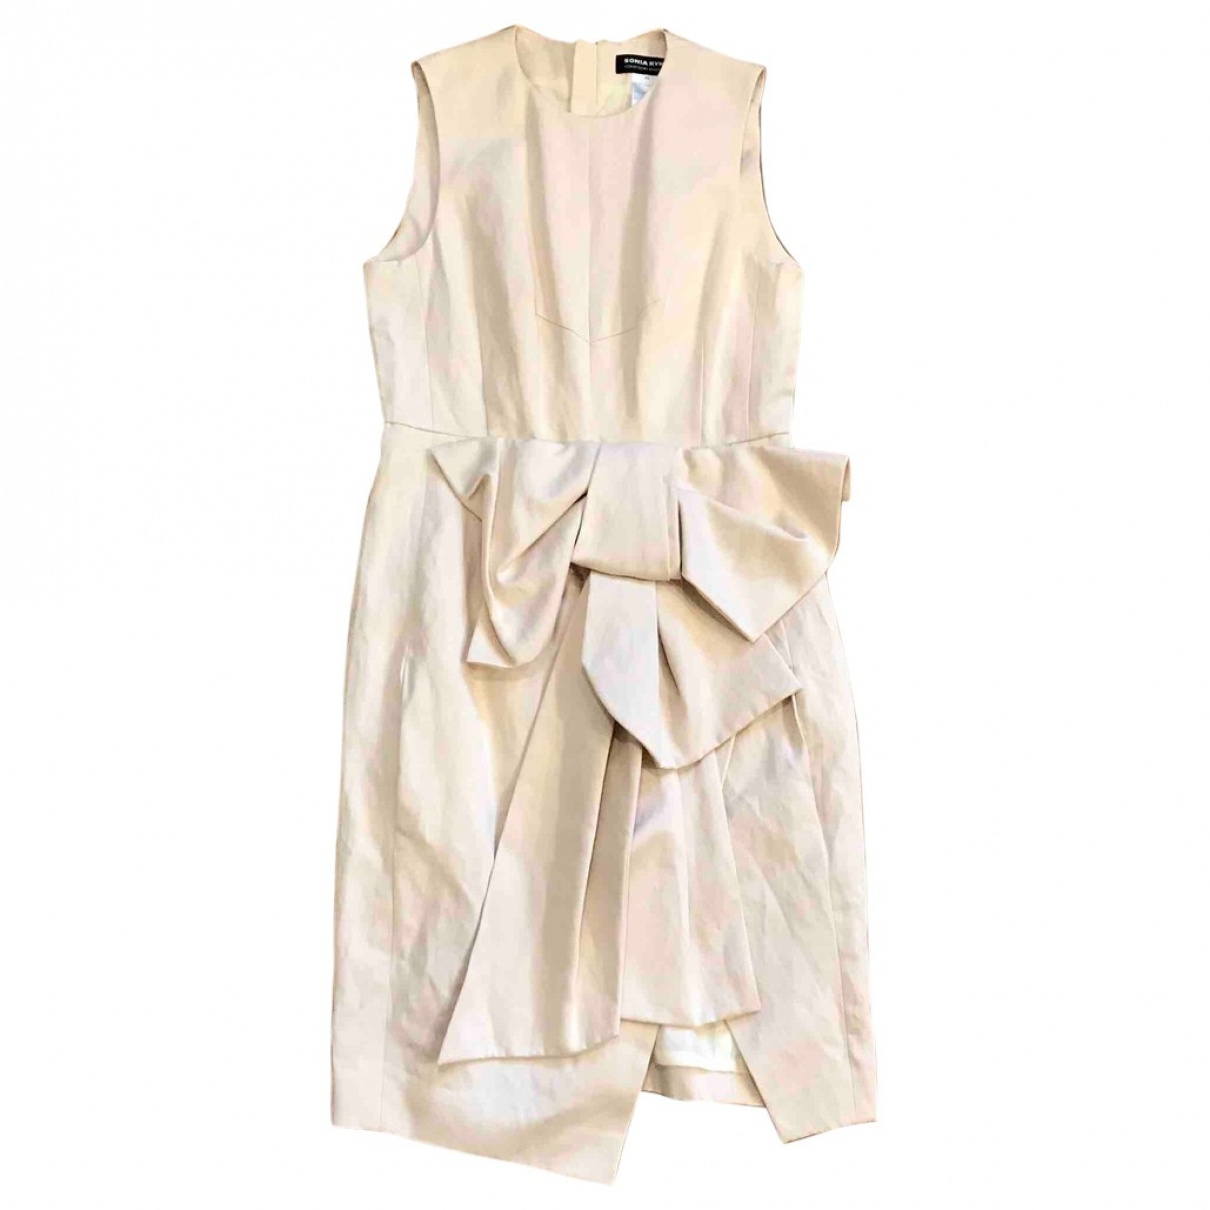 Sonia Rykiel \N Ecru Cotton dress for Women 42 FR